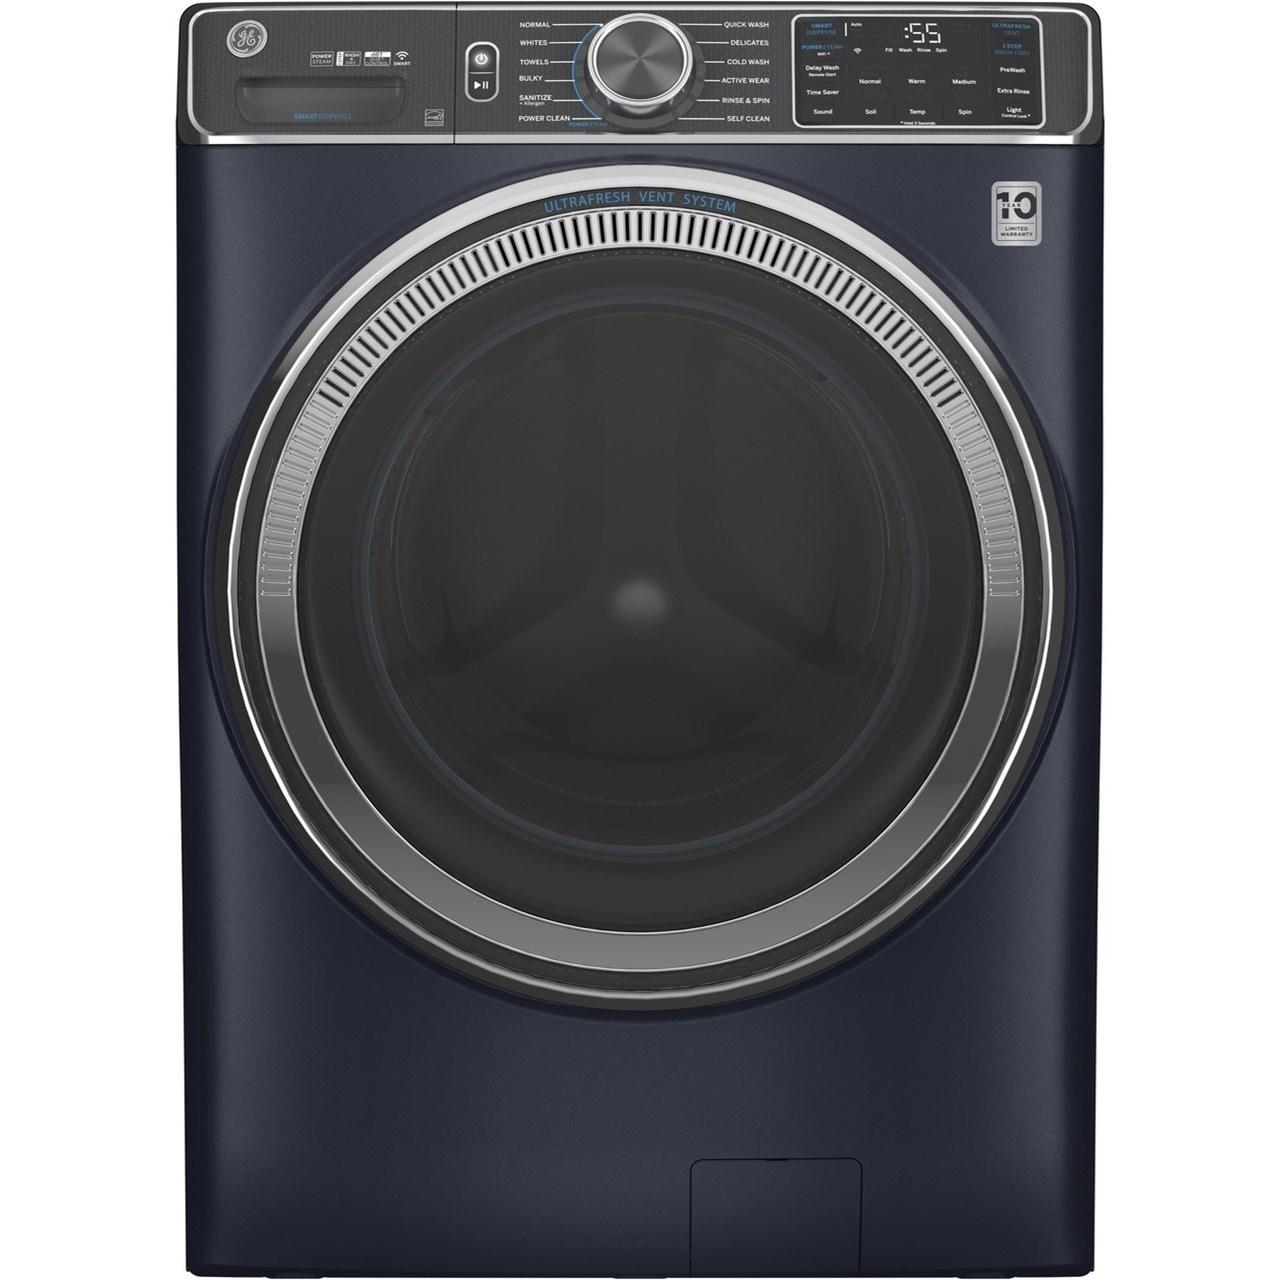 GE® 5.0 cu. ft. Capacity Smart Washer